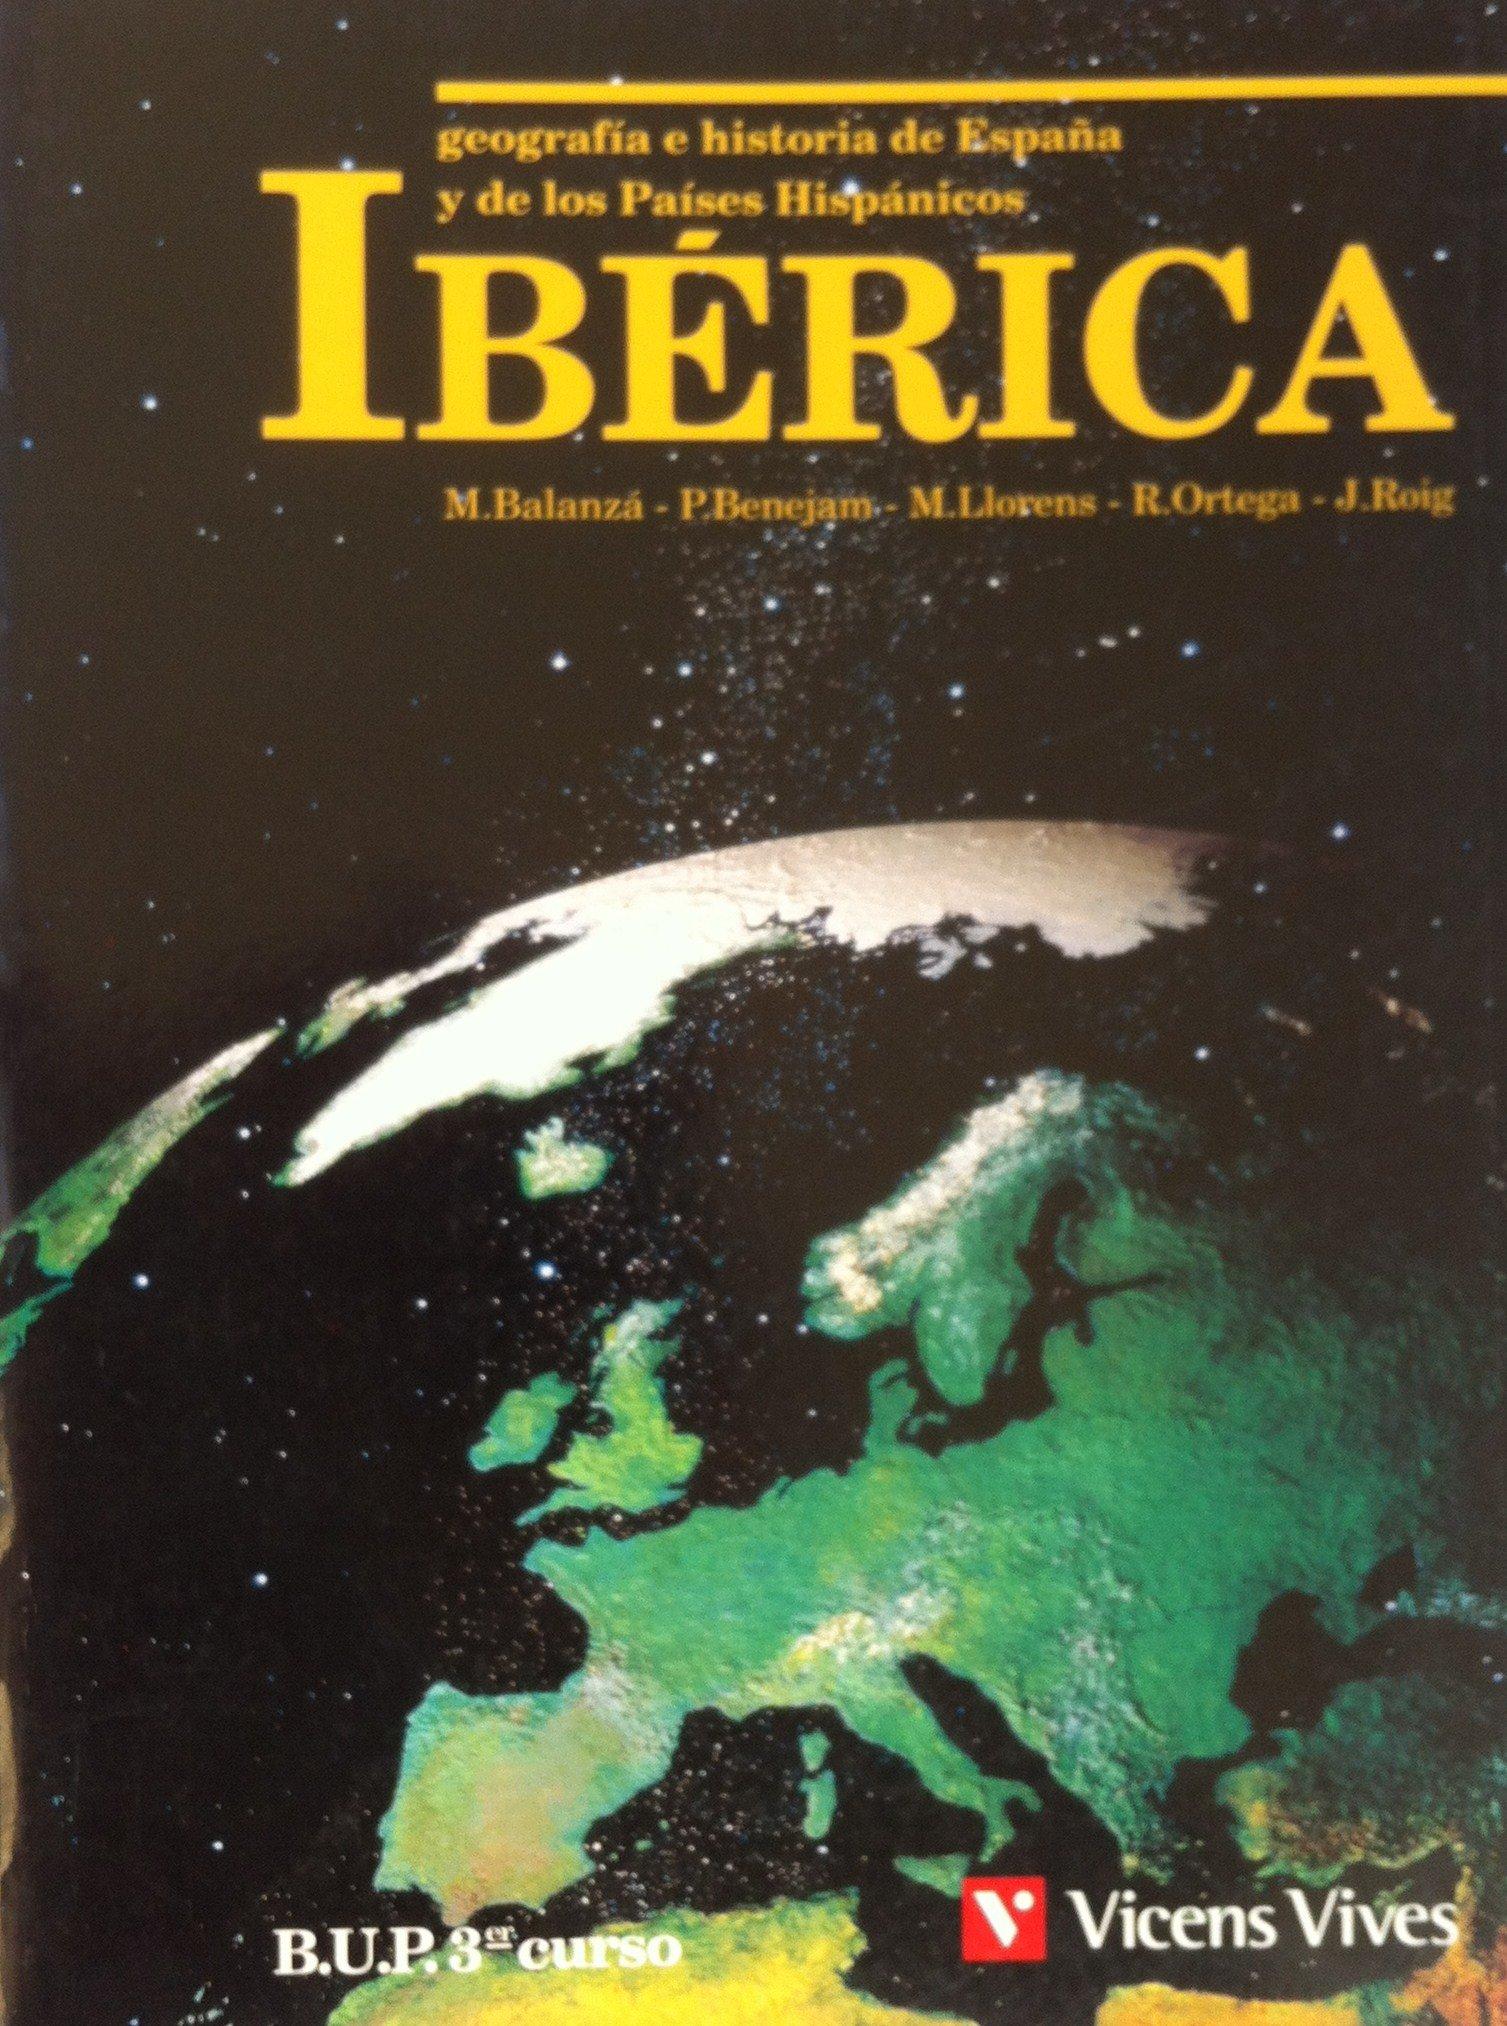 Iberica : geografia e historia, 3 bup: Amazon.es: Balanza Perez, Manuela, Benejam,: Libros